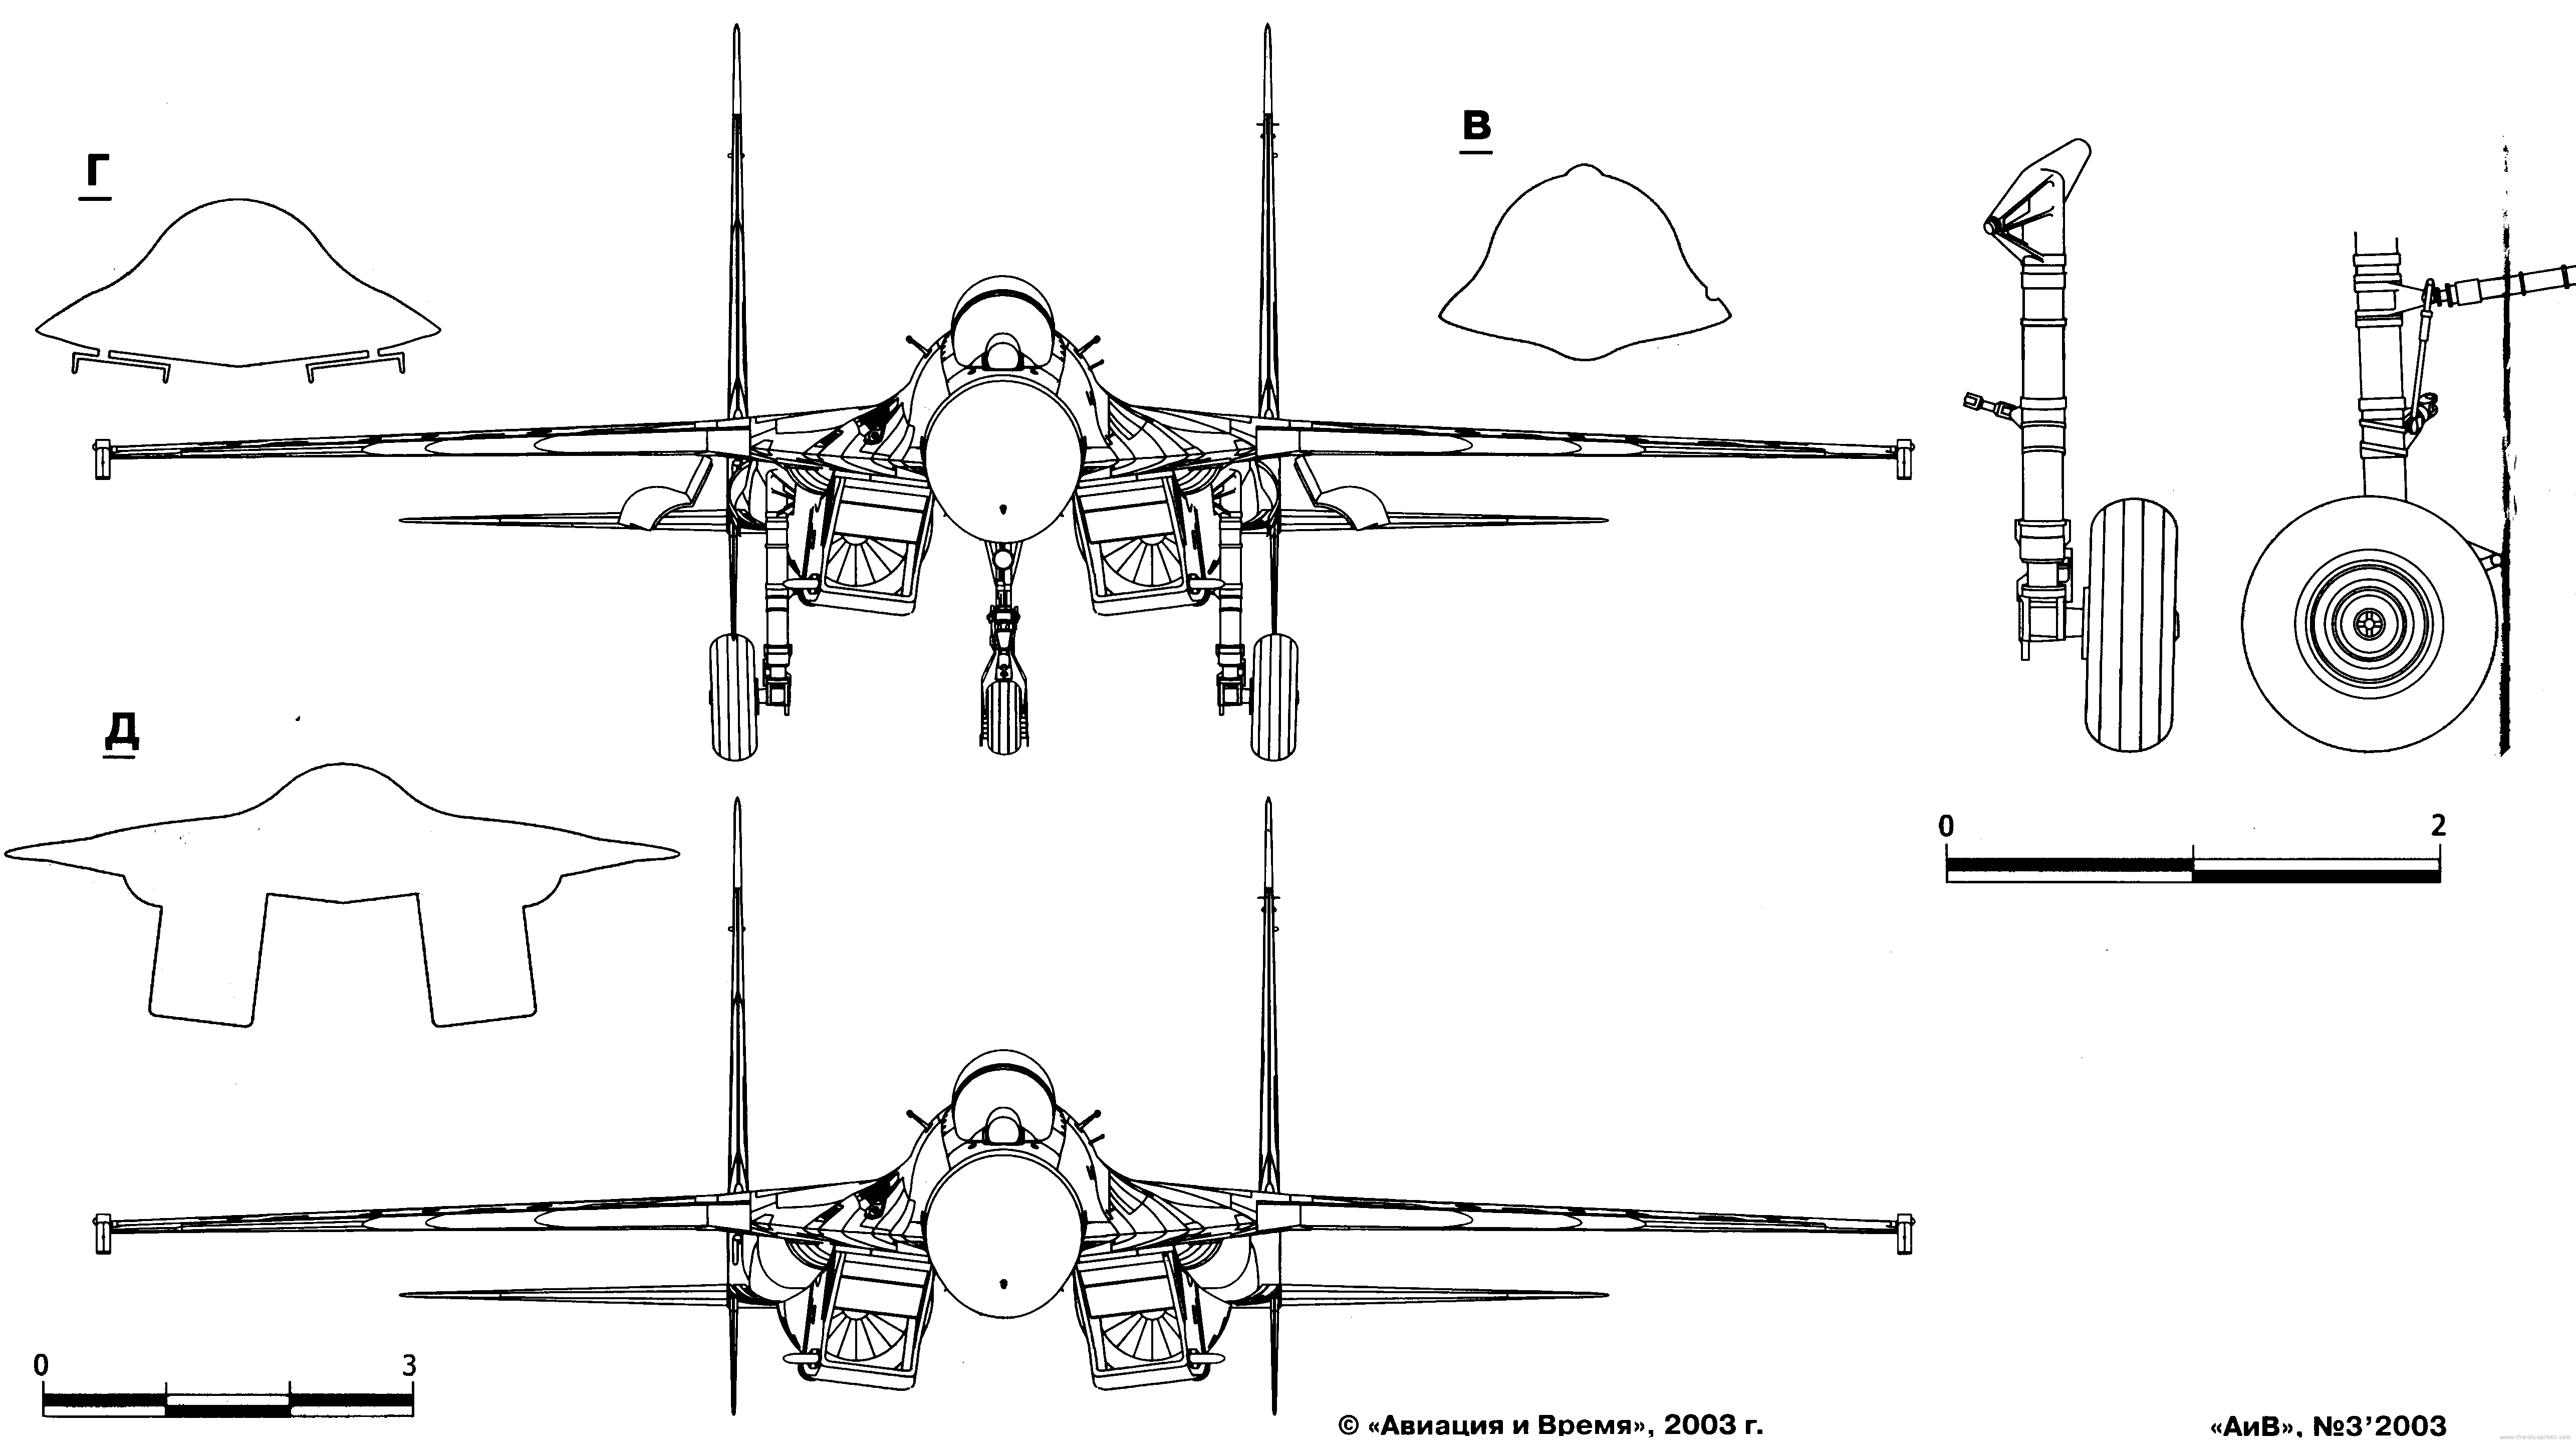 sukhojj su 27 14 sukhoi su 27 flanker fighter su-27 em diagram at crackthecode.co